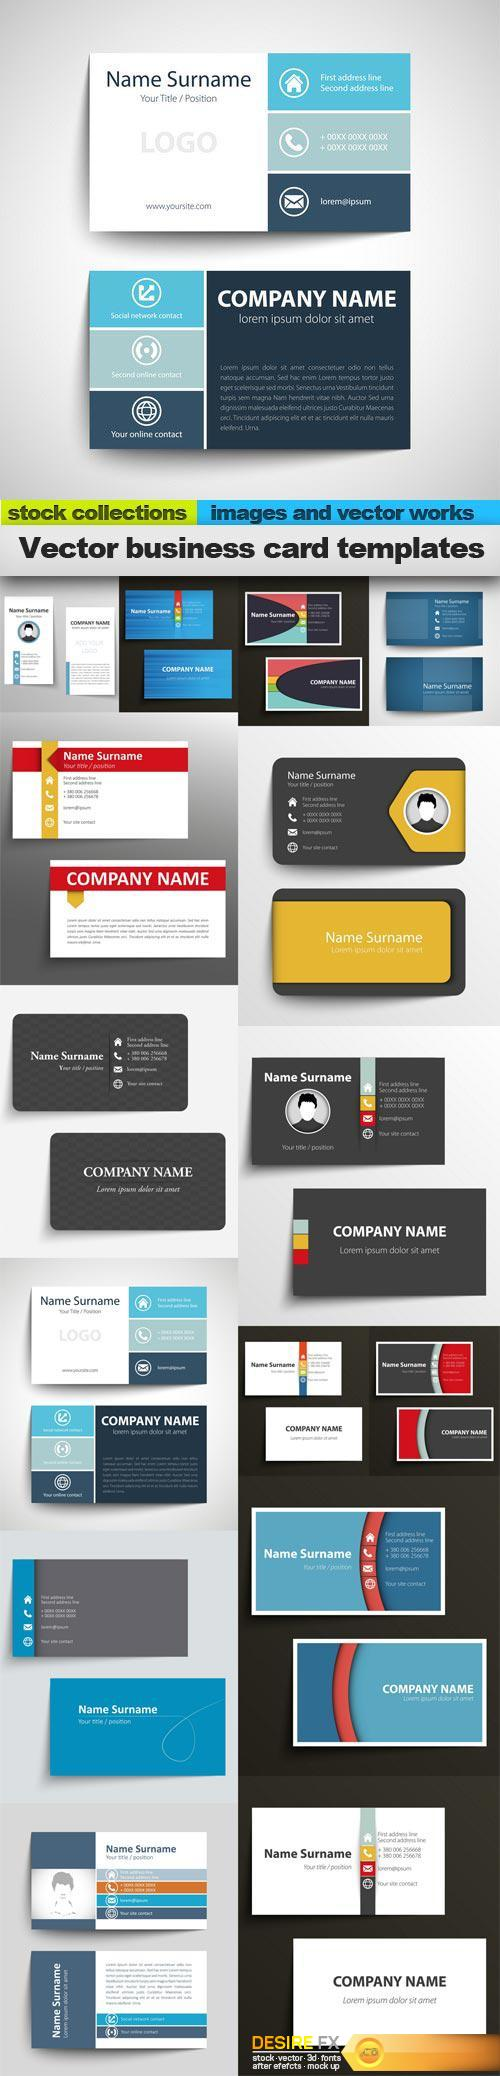 Vector business card templates 15 x eps httpdesirefx vector business card templates 15 x eps httpdesirefx fbccfo Choice Image